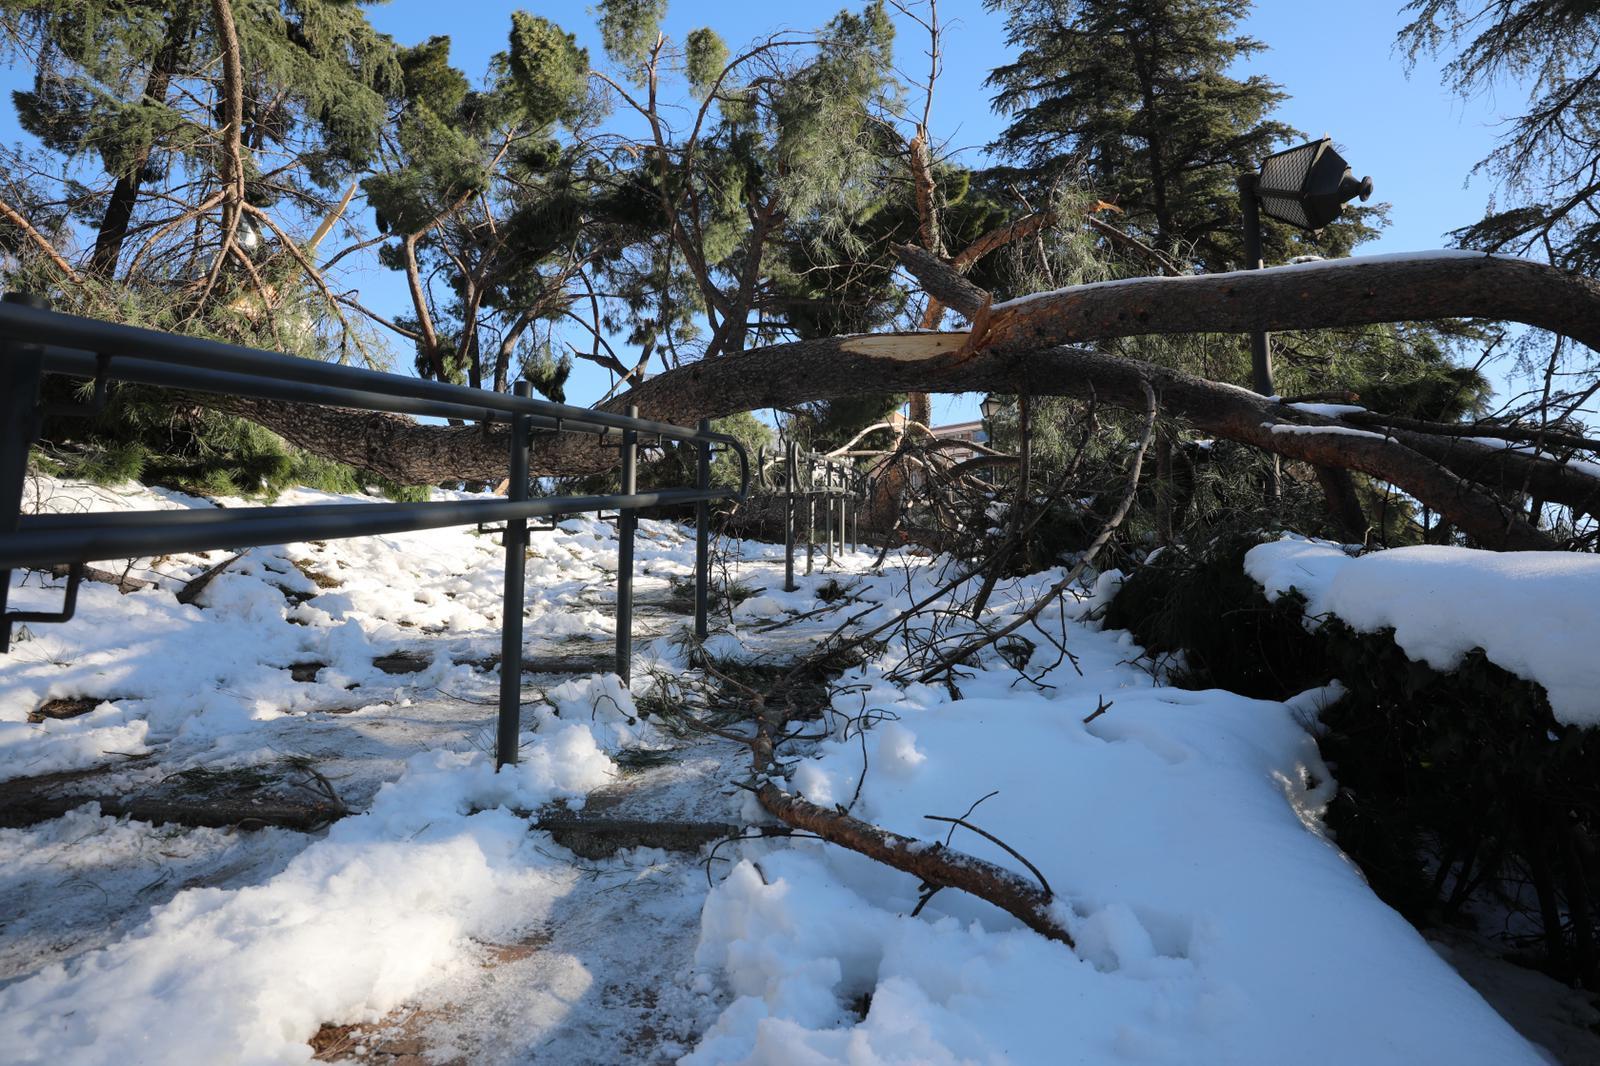 Nieve Nevada Danos Madrid Filomena 03